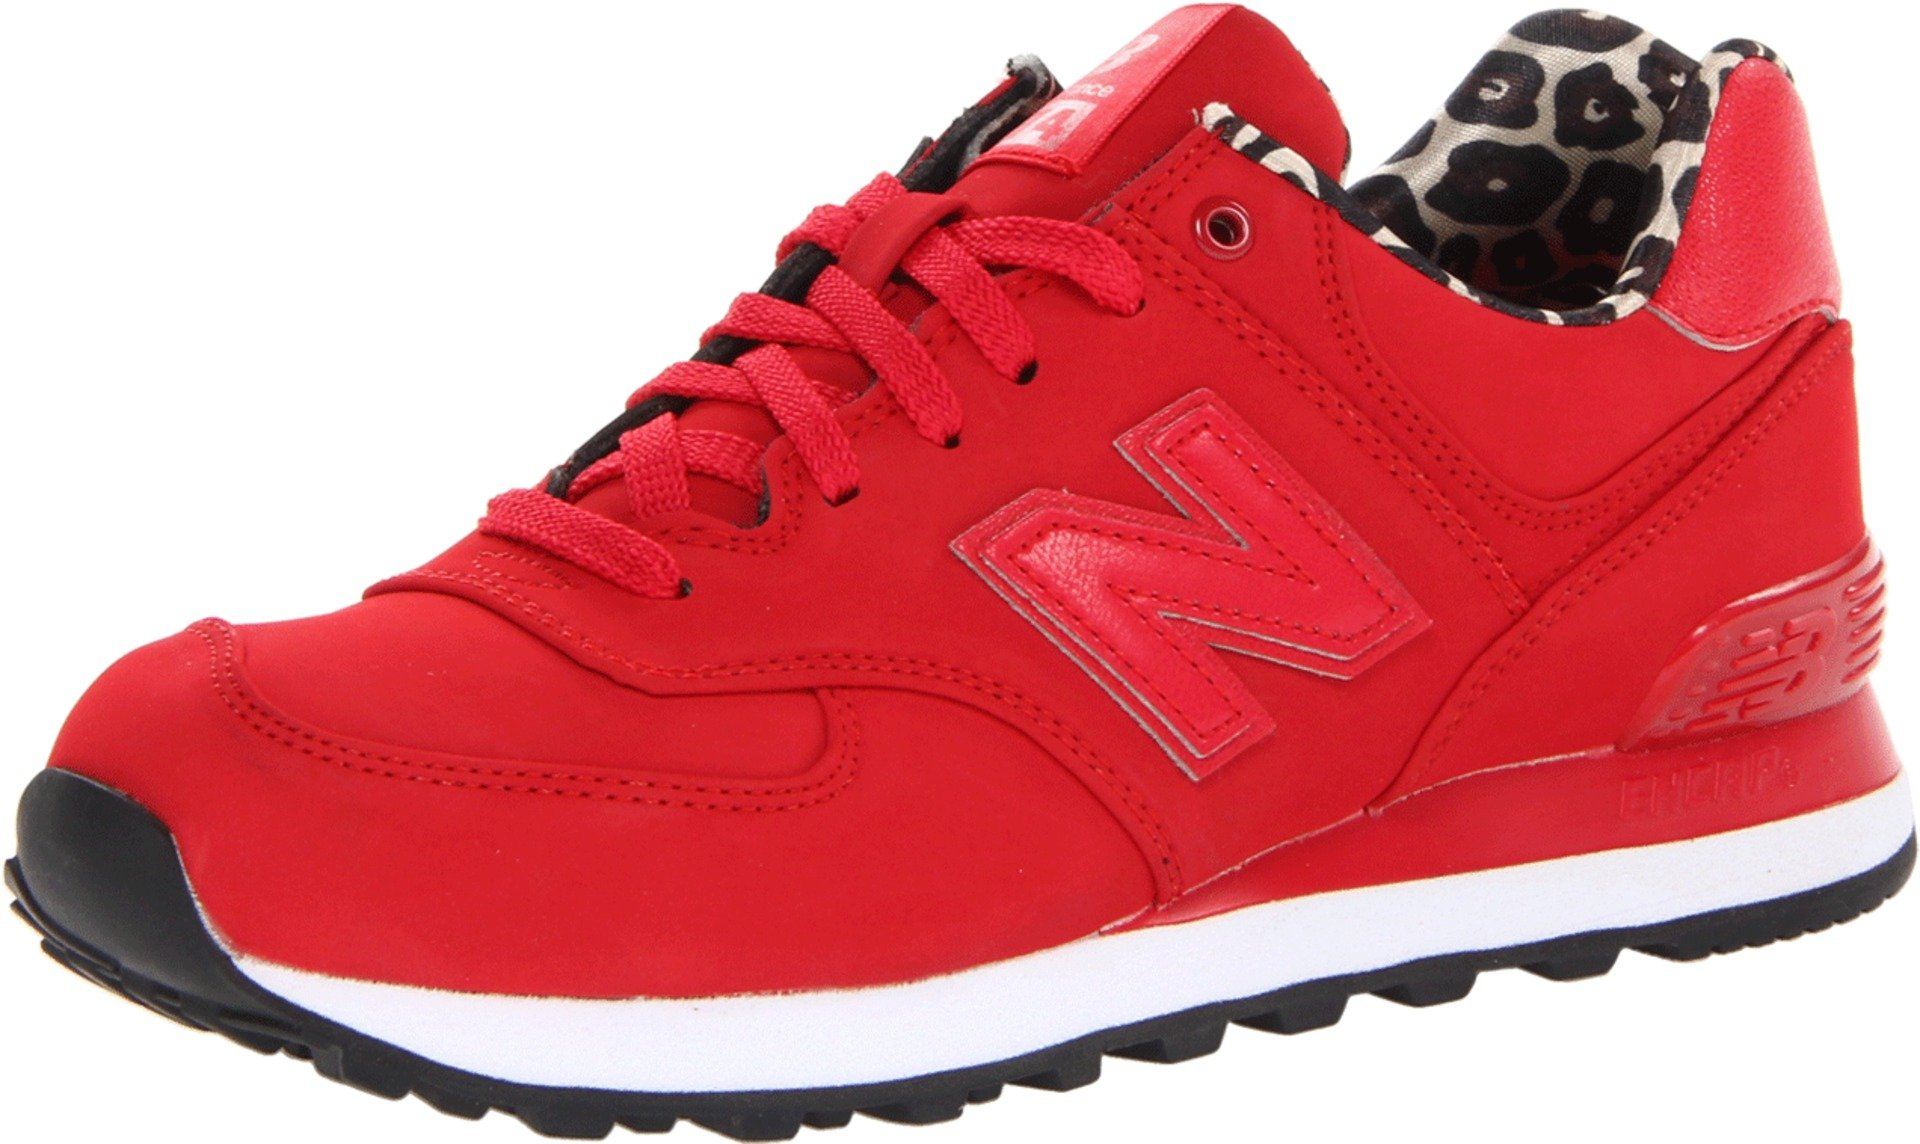 new balance 574 red womens